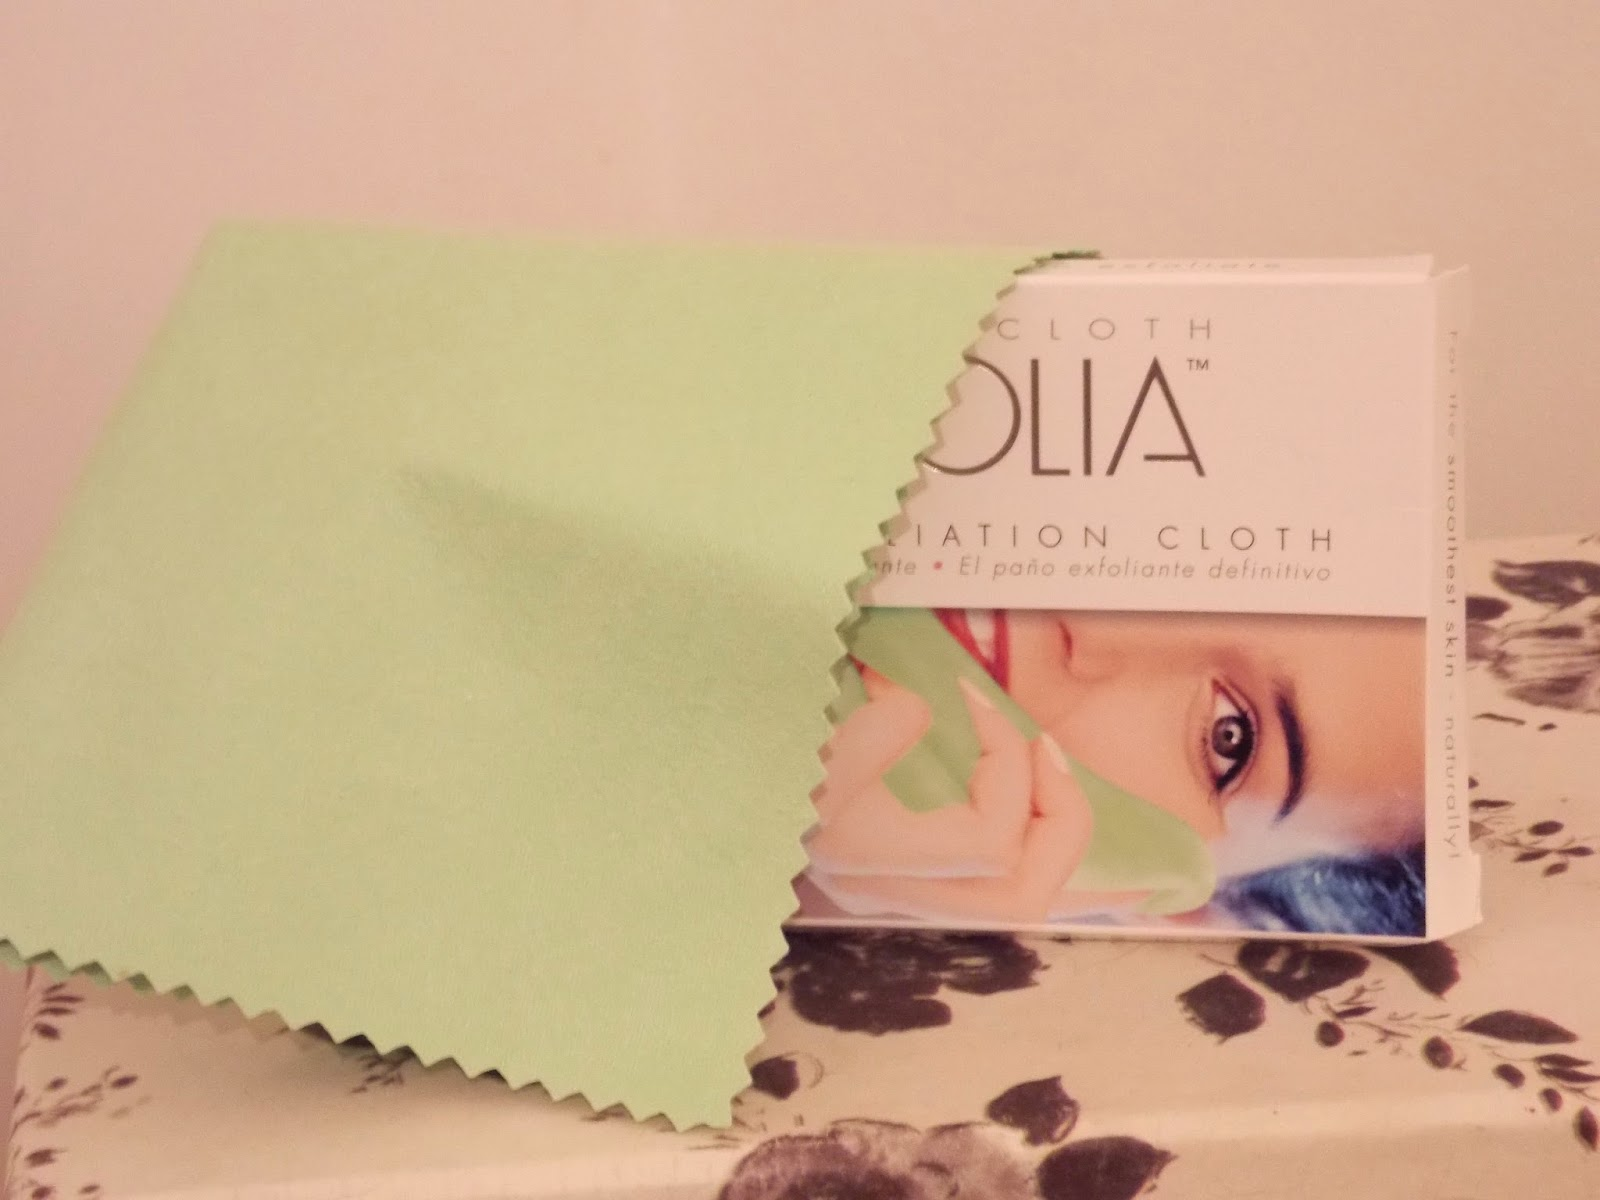 Exfolia Microexfoliation Cloth